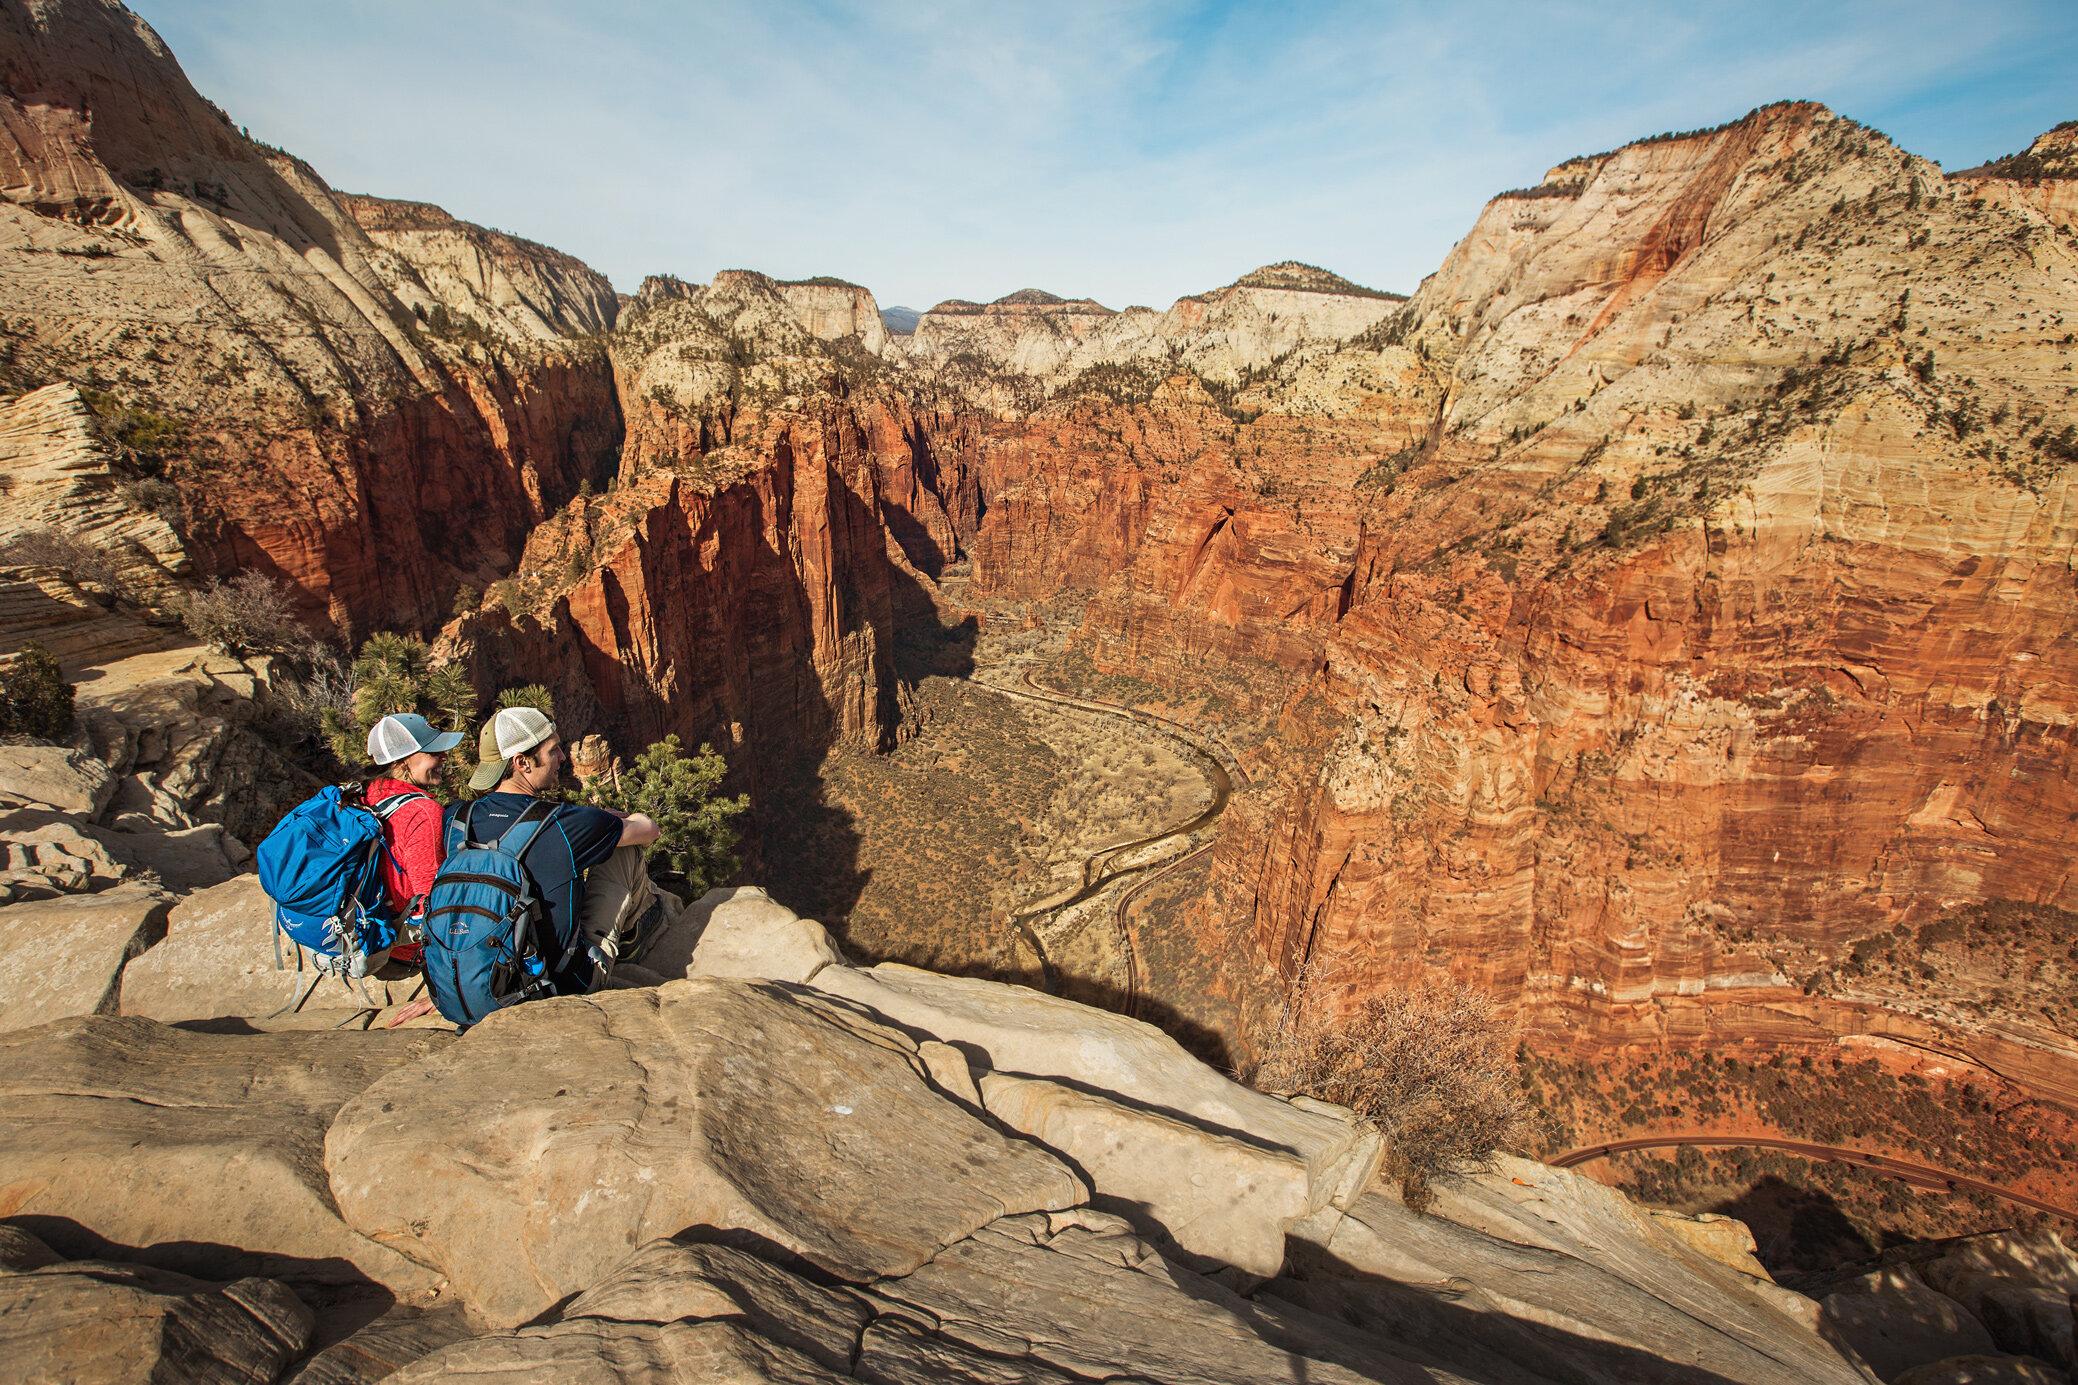 CindyGiovagnoli_Road_Trip_Travel_National_Parks_Explore_America-085.jpg